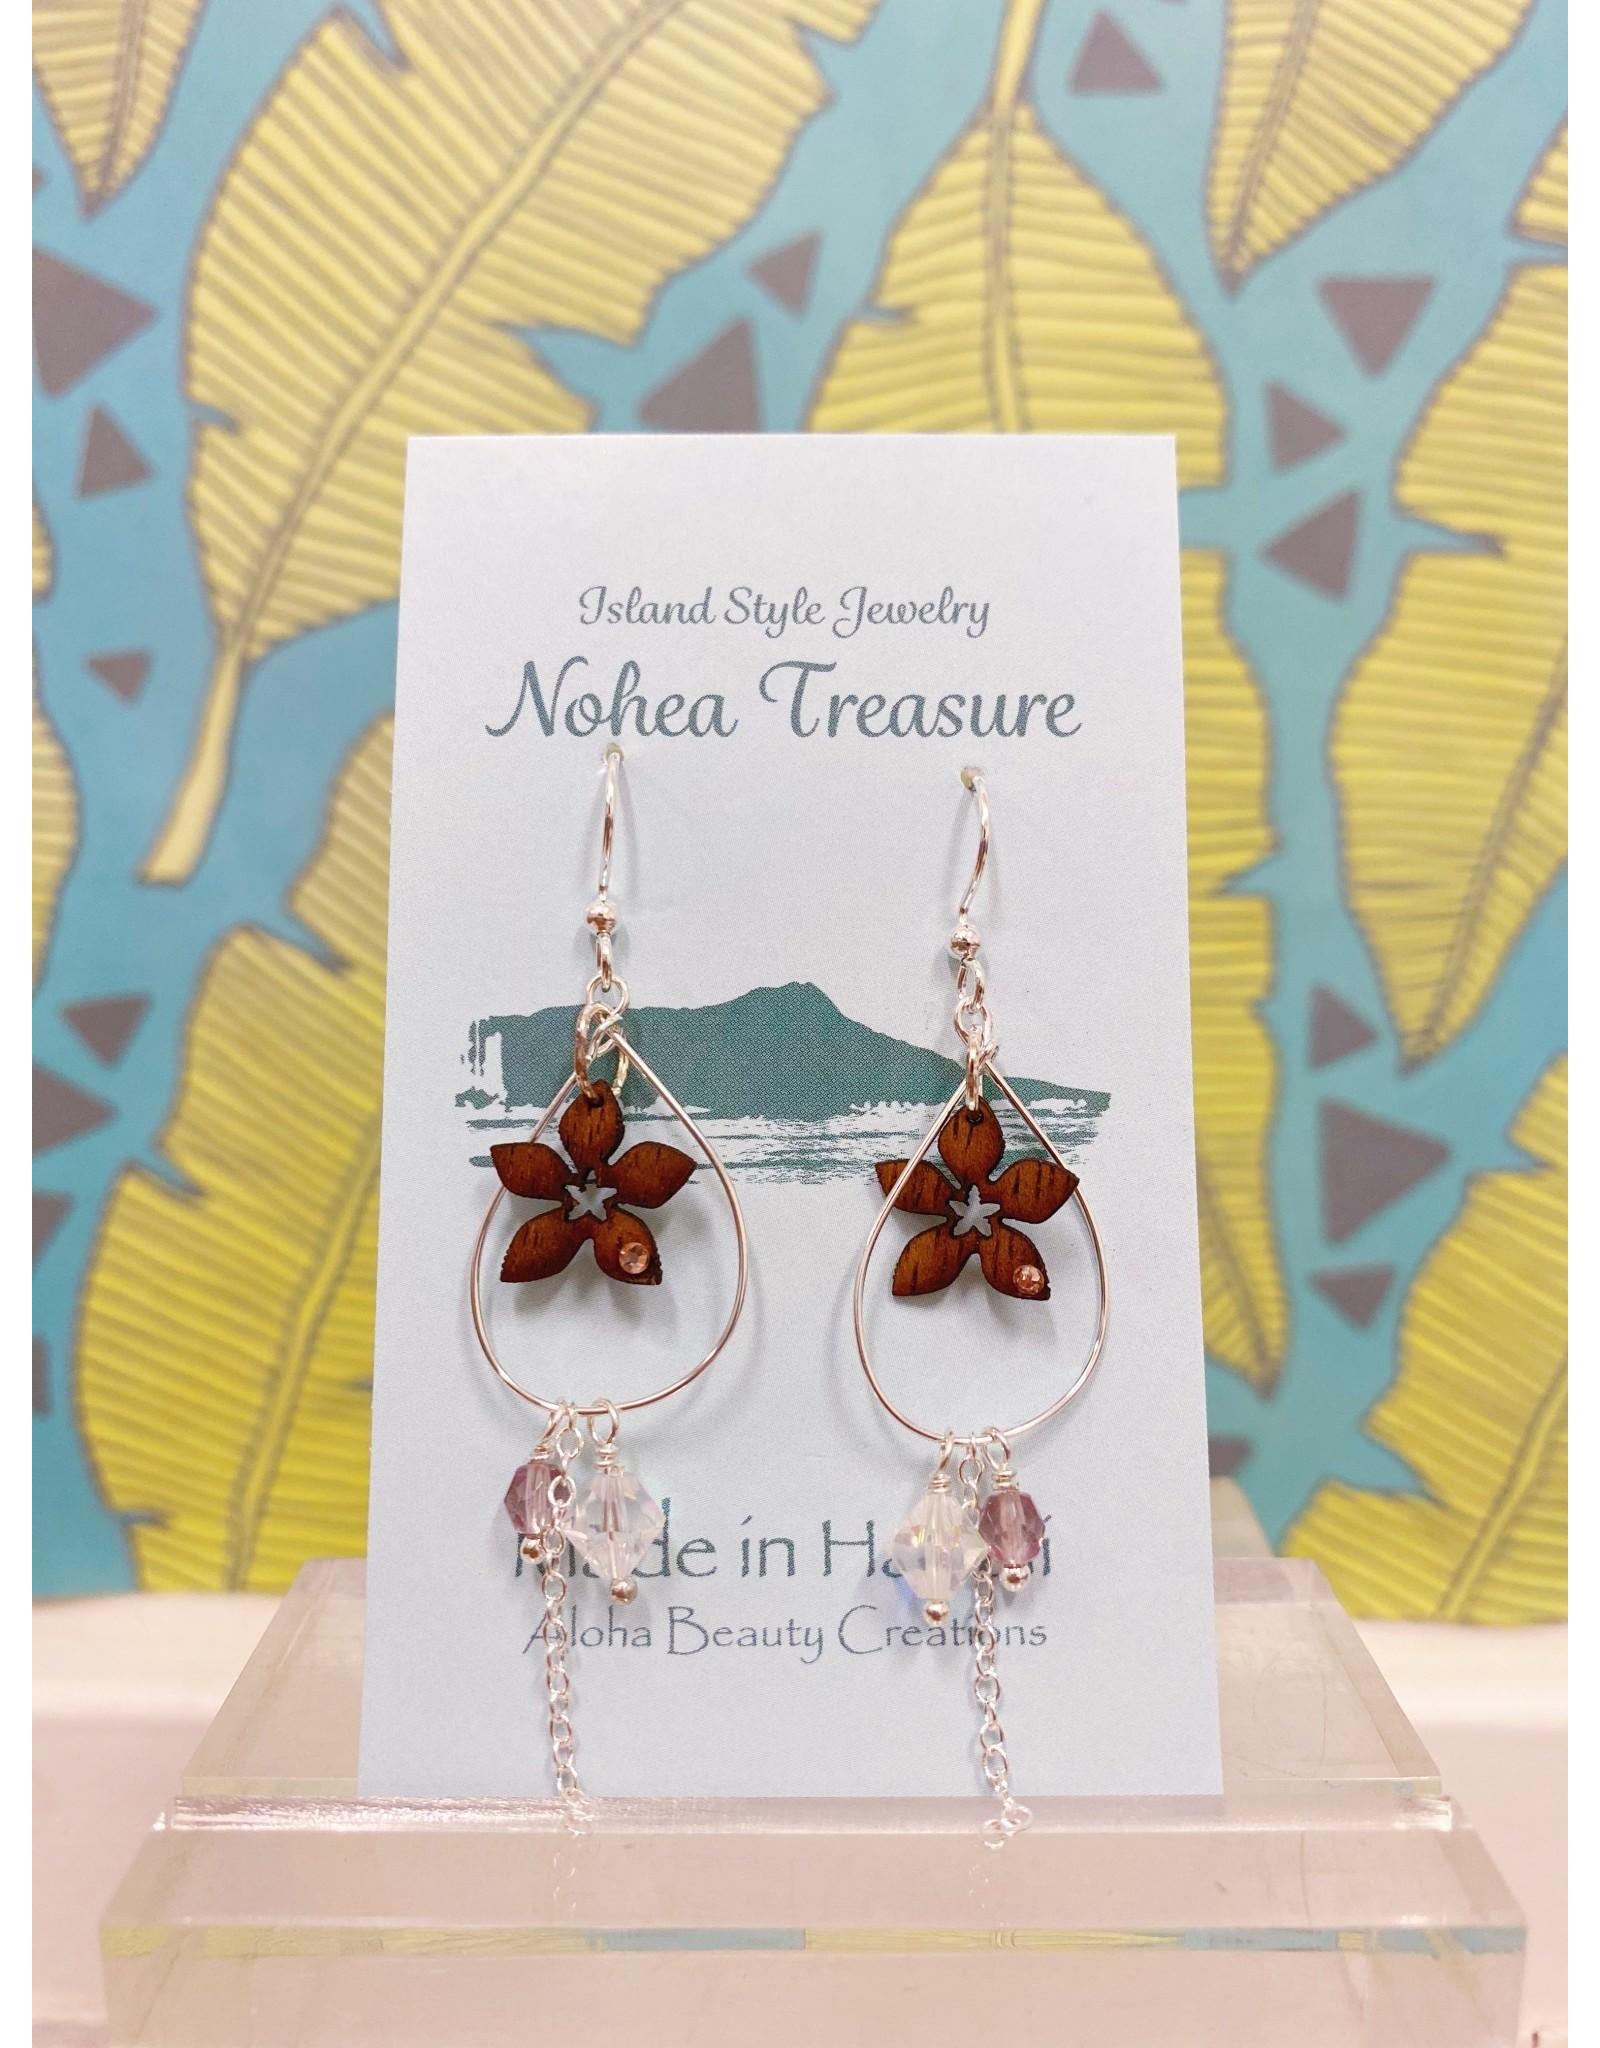 Aloha Beauty Creations Nohea Treasure Accessories Earrings Plumeria/Hoop